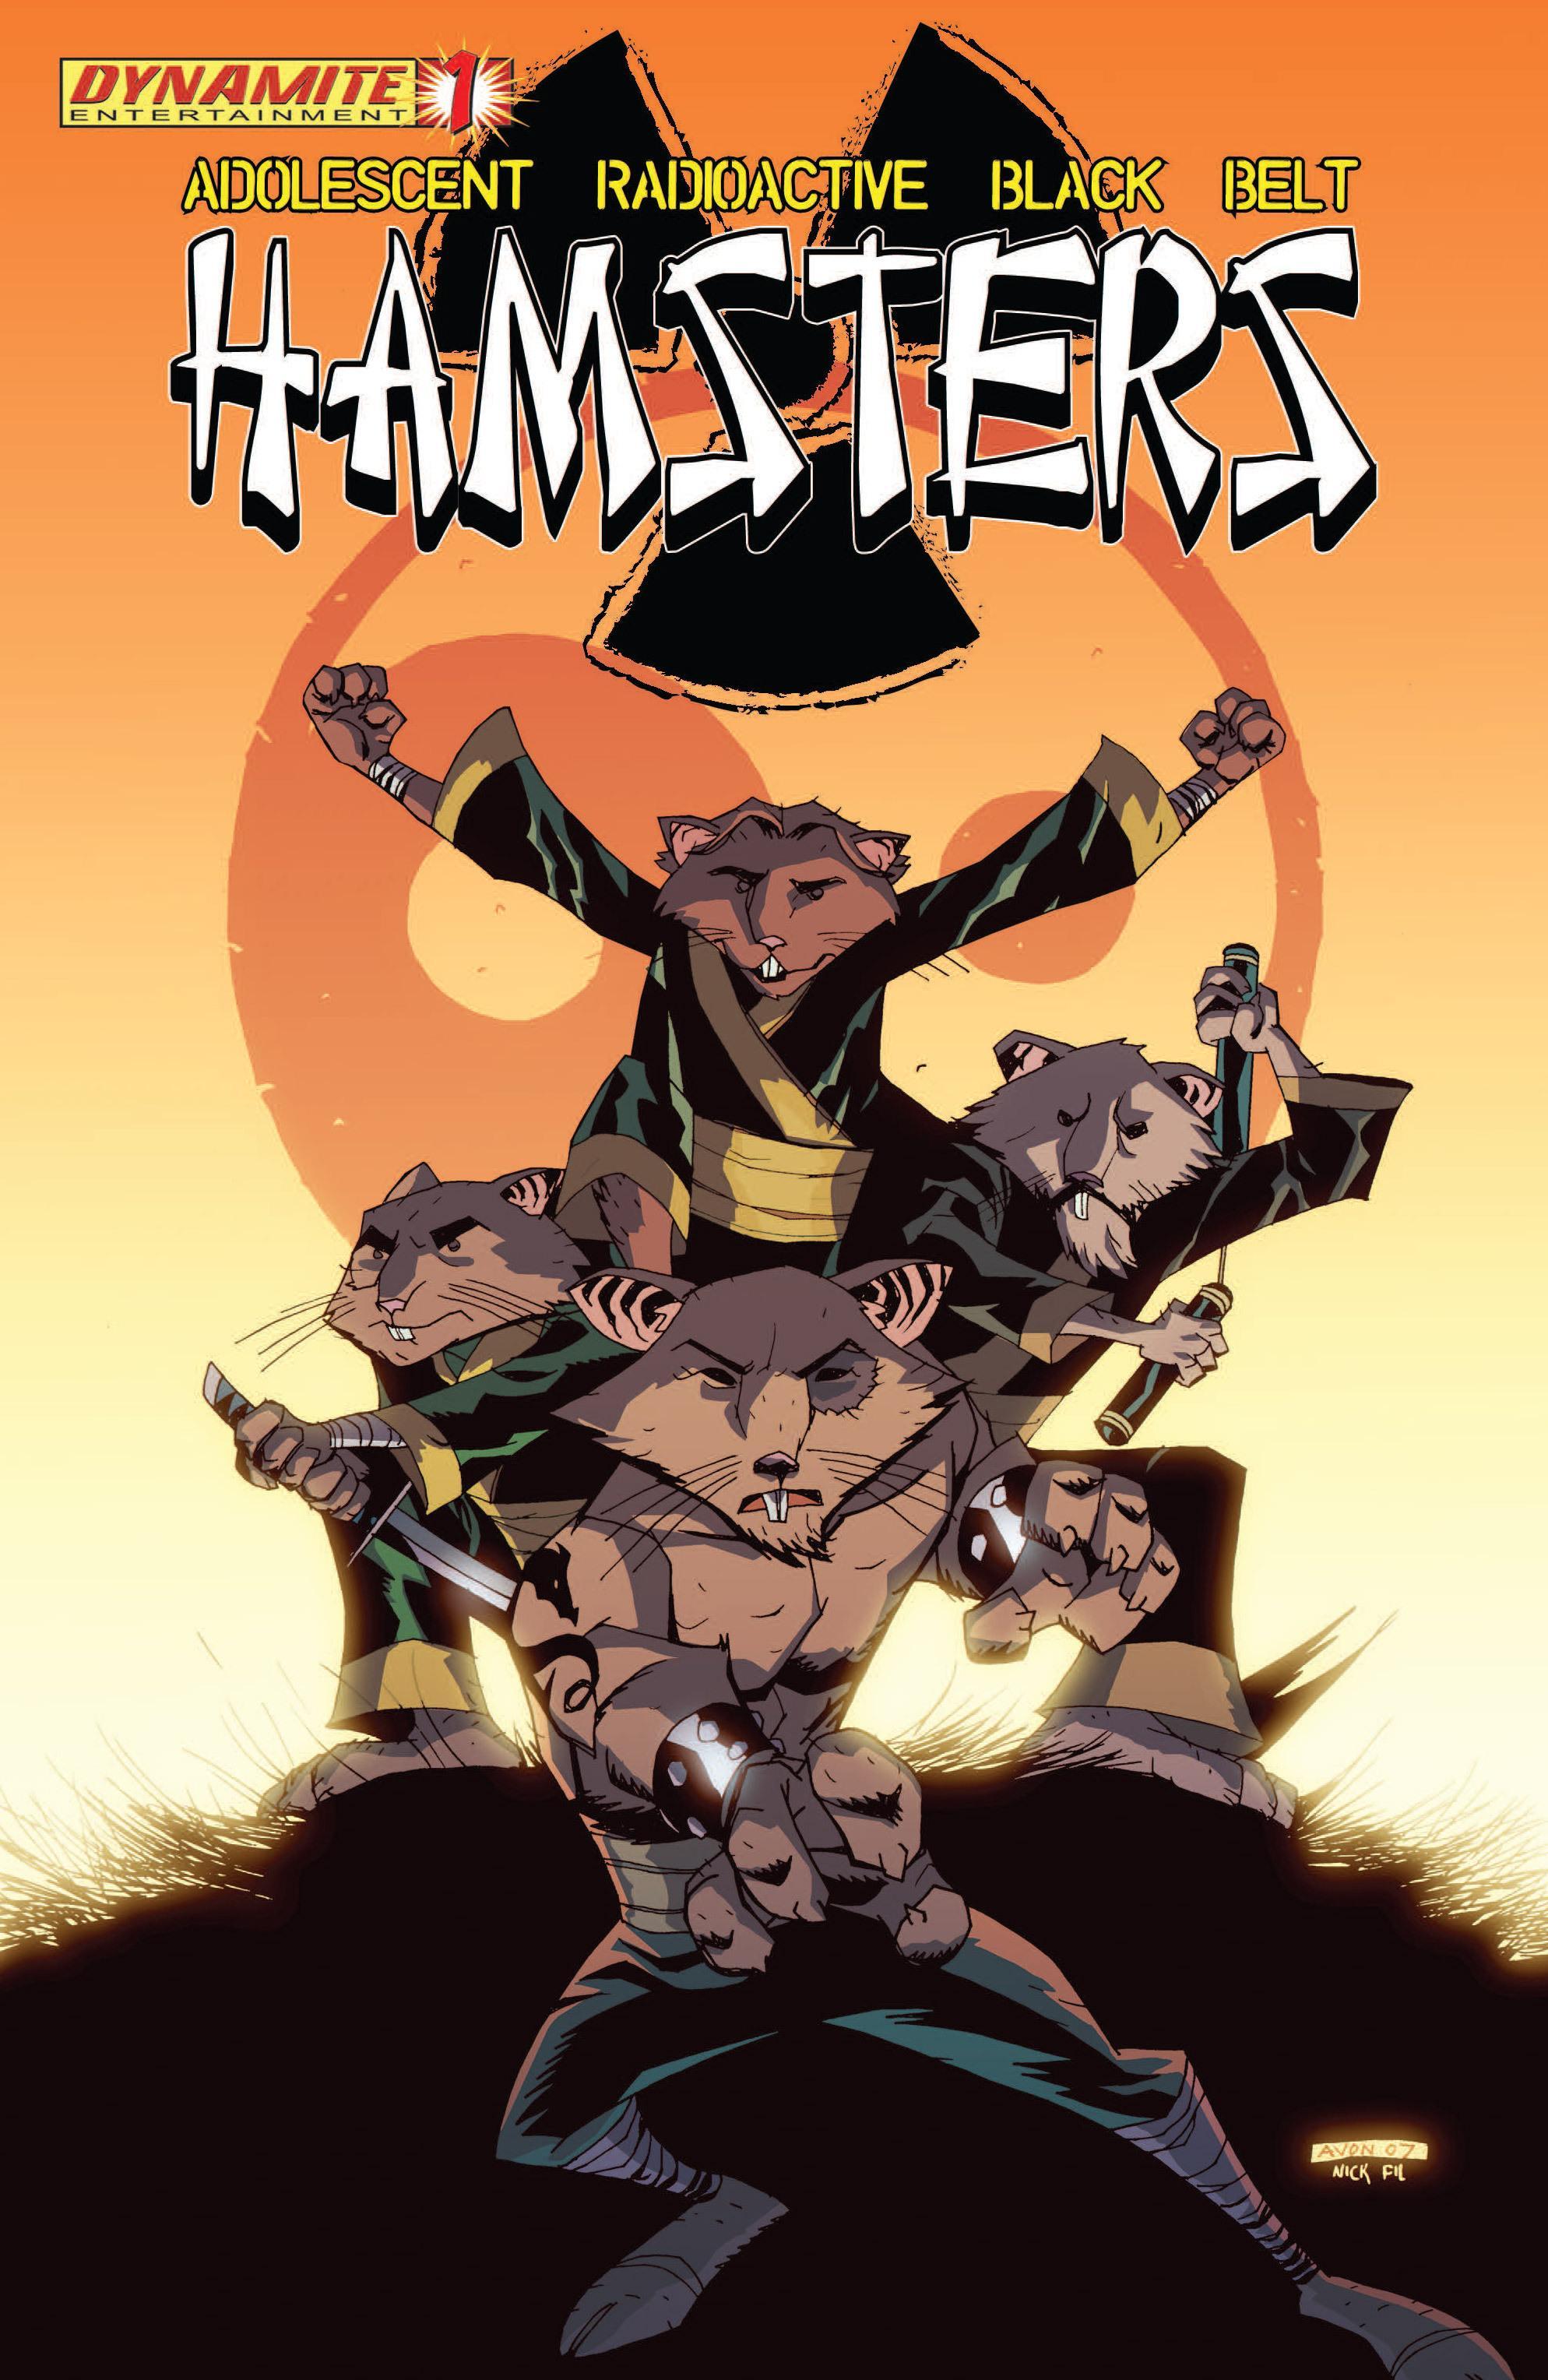 Adolescent Radioactive Black Belt Hamsters 001 (2008) (Digital) (Relic-Empire